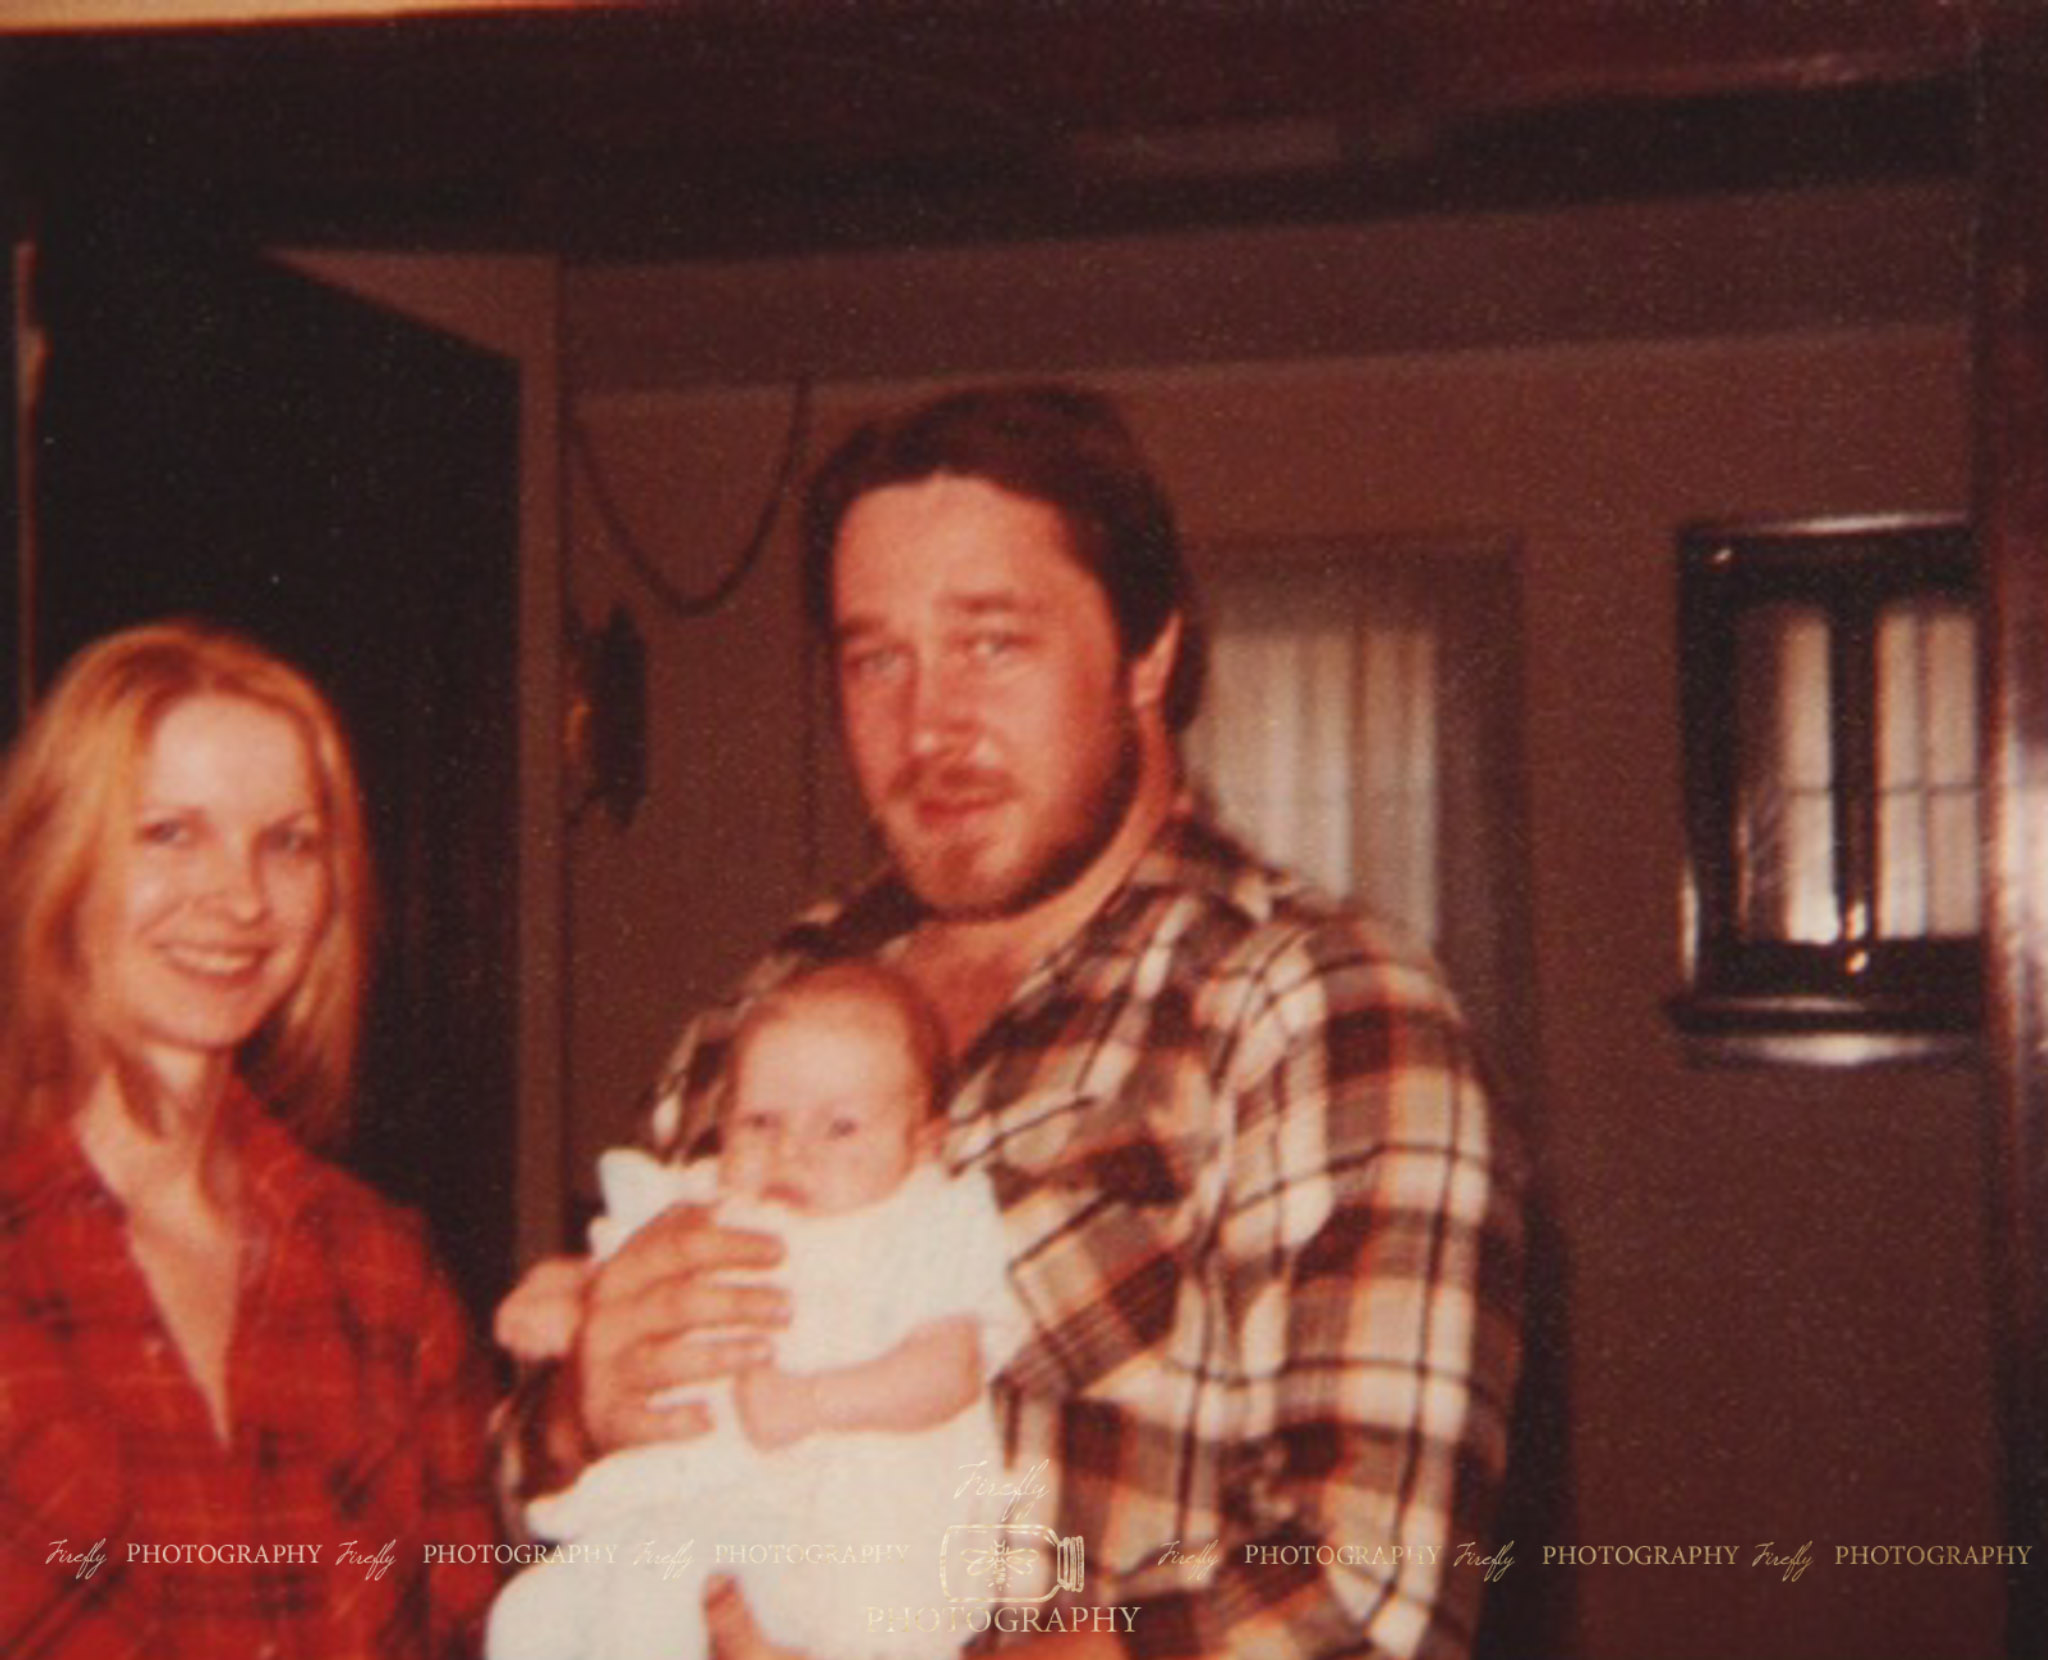 Doesn't my dad look like Russel Crowe?